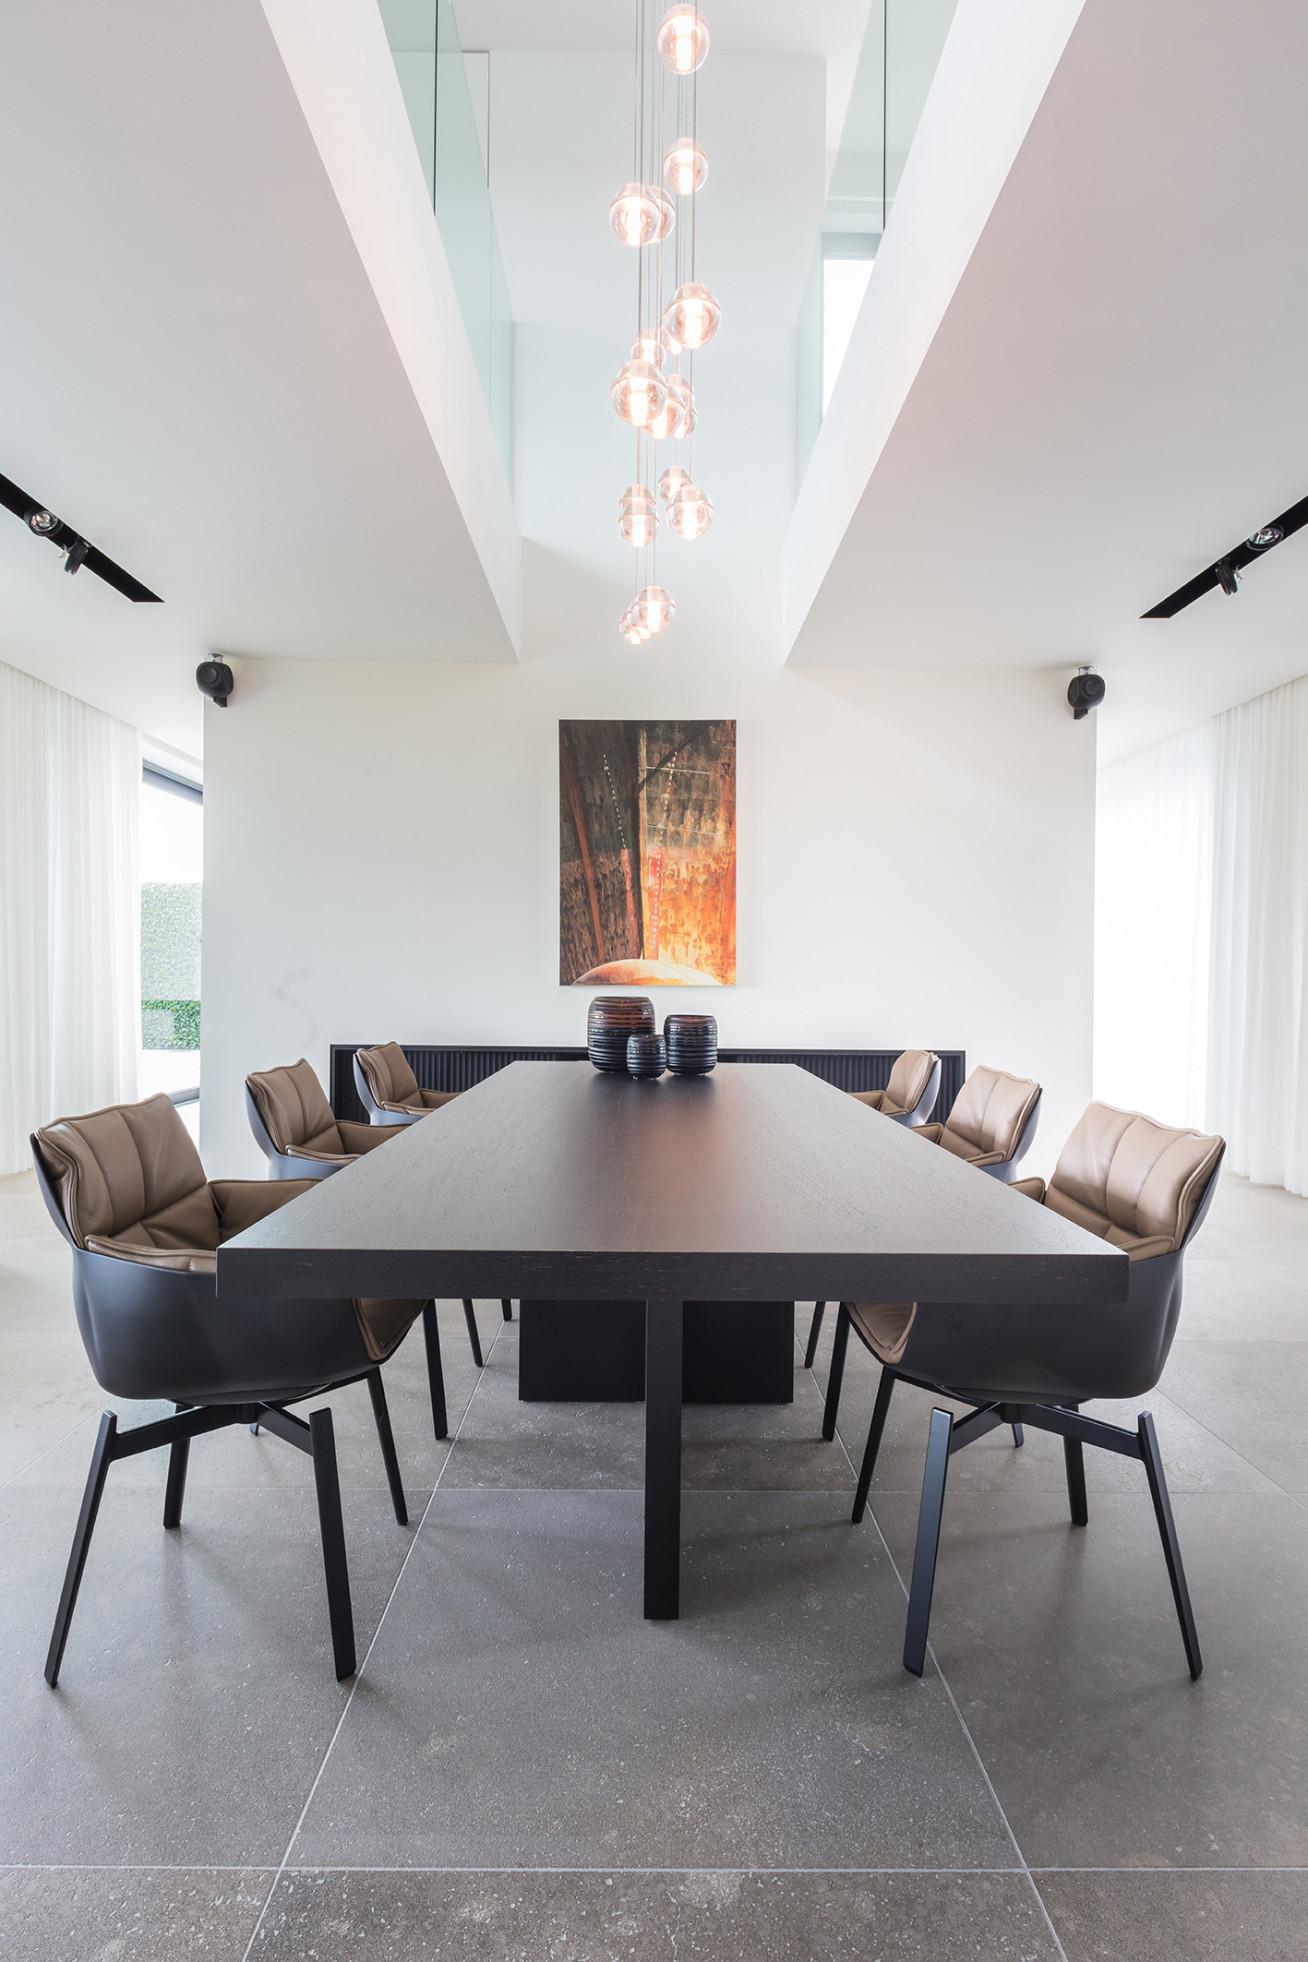 Indulging design  Design classics of B&B Italia, Walter Knoll and Baxter furnish this...